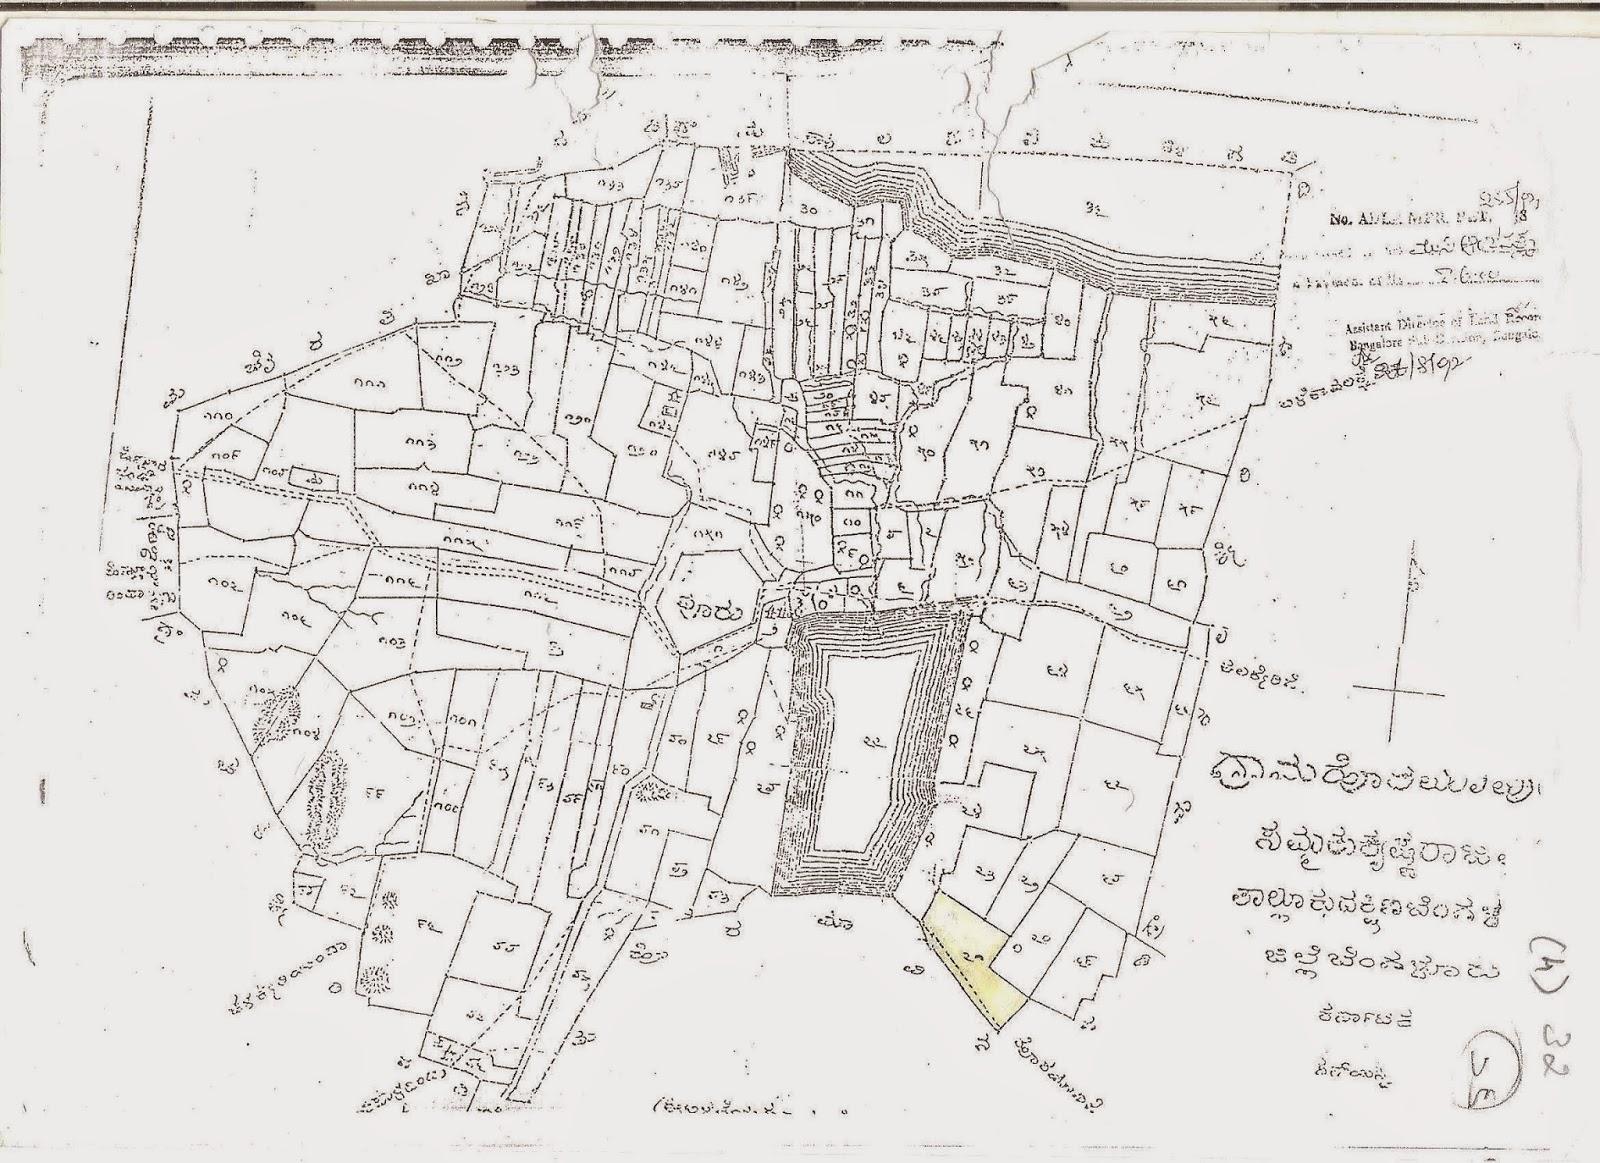 Village map with survey numbers karnataka